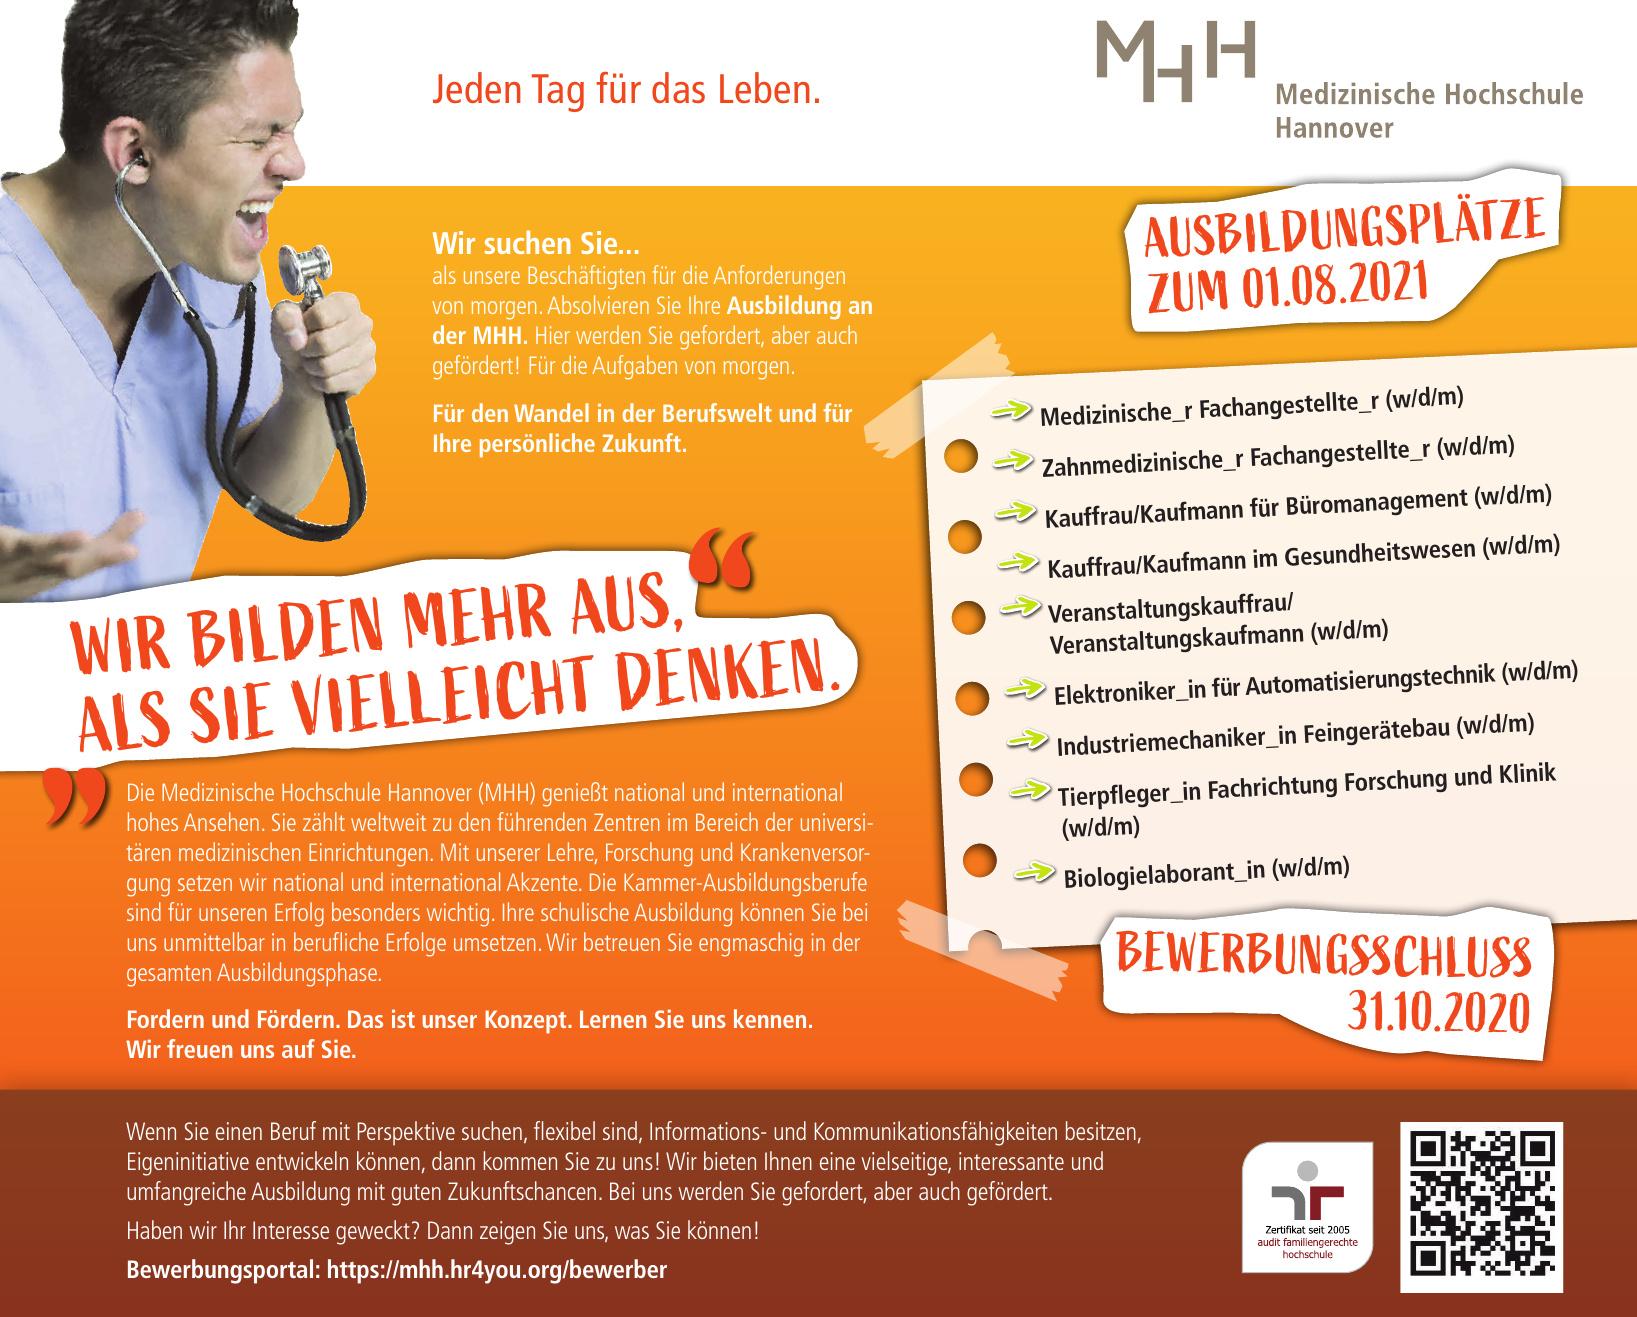 Medizinische Hochschule Hannover (MHH)